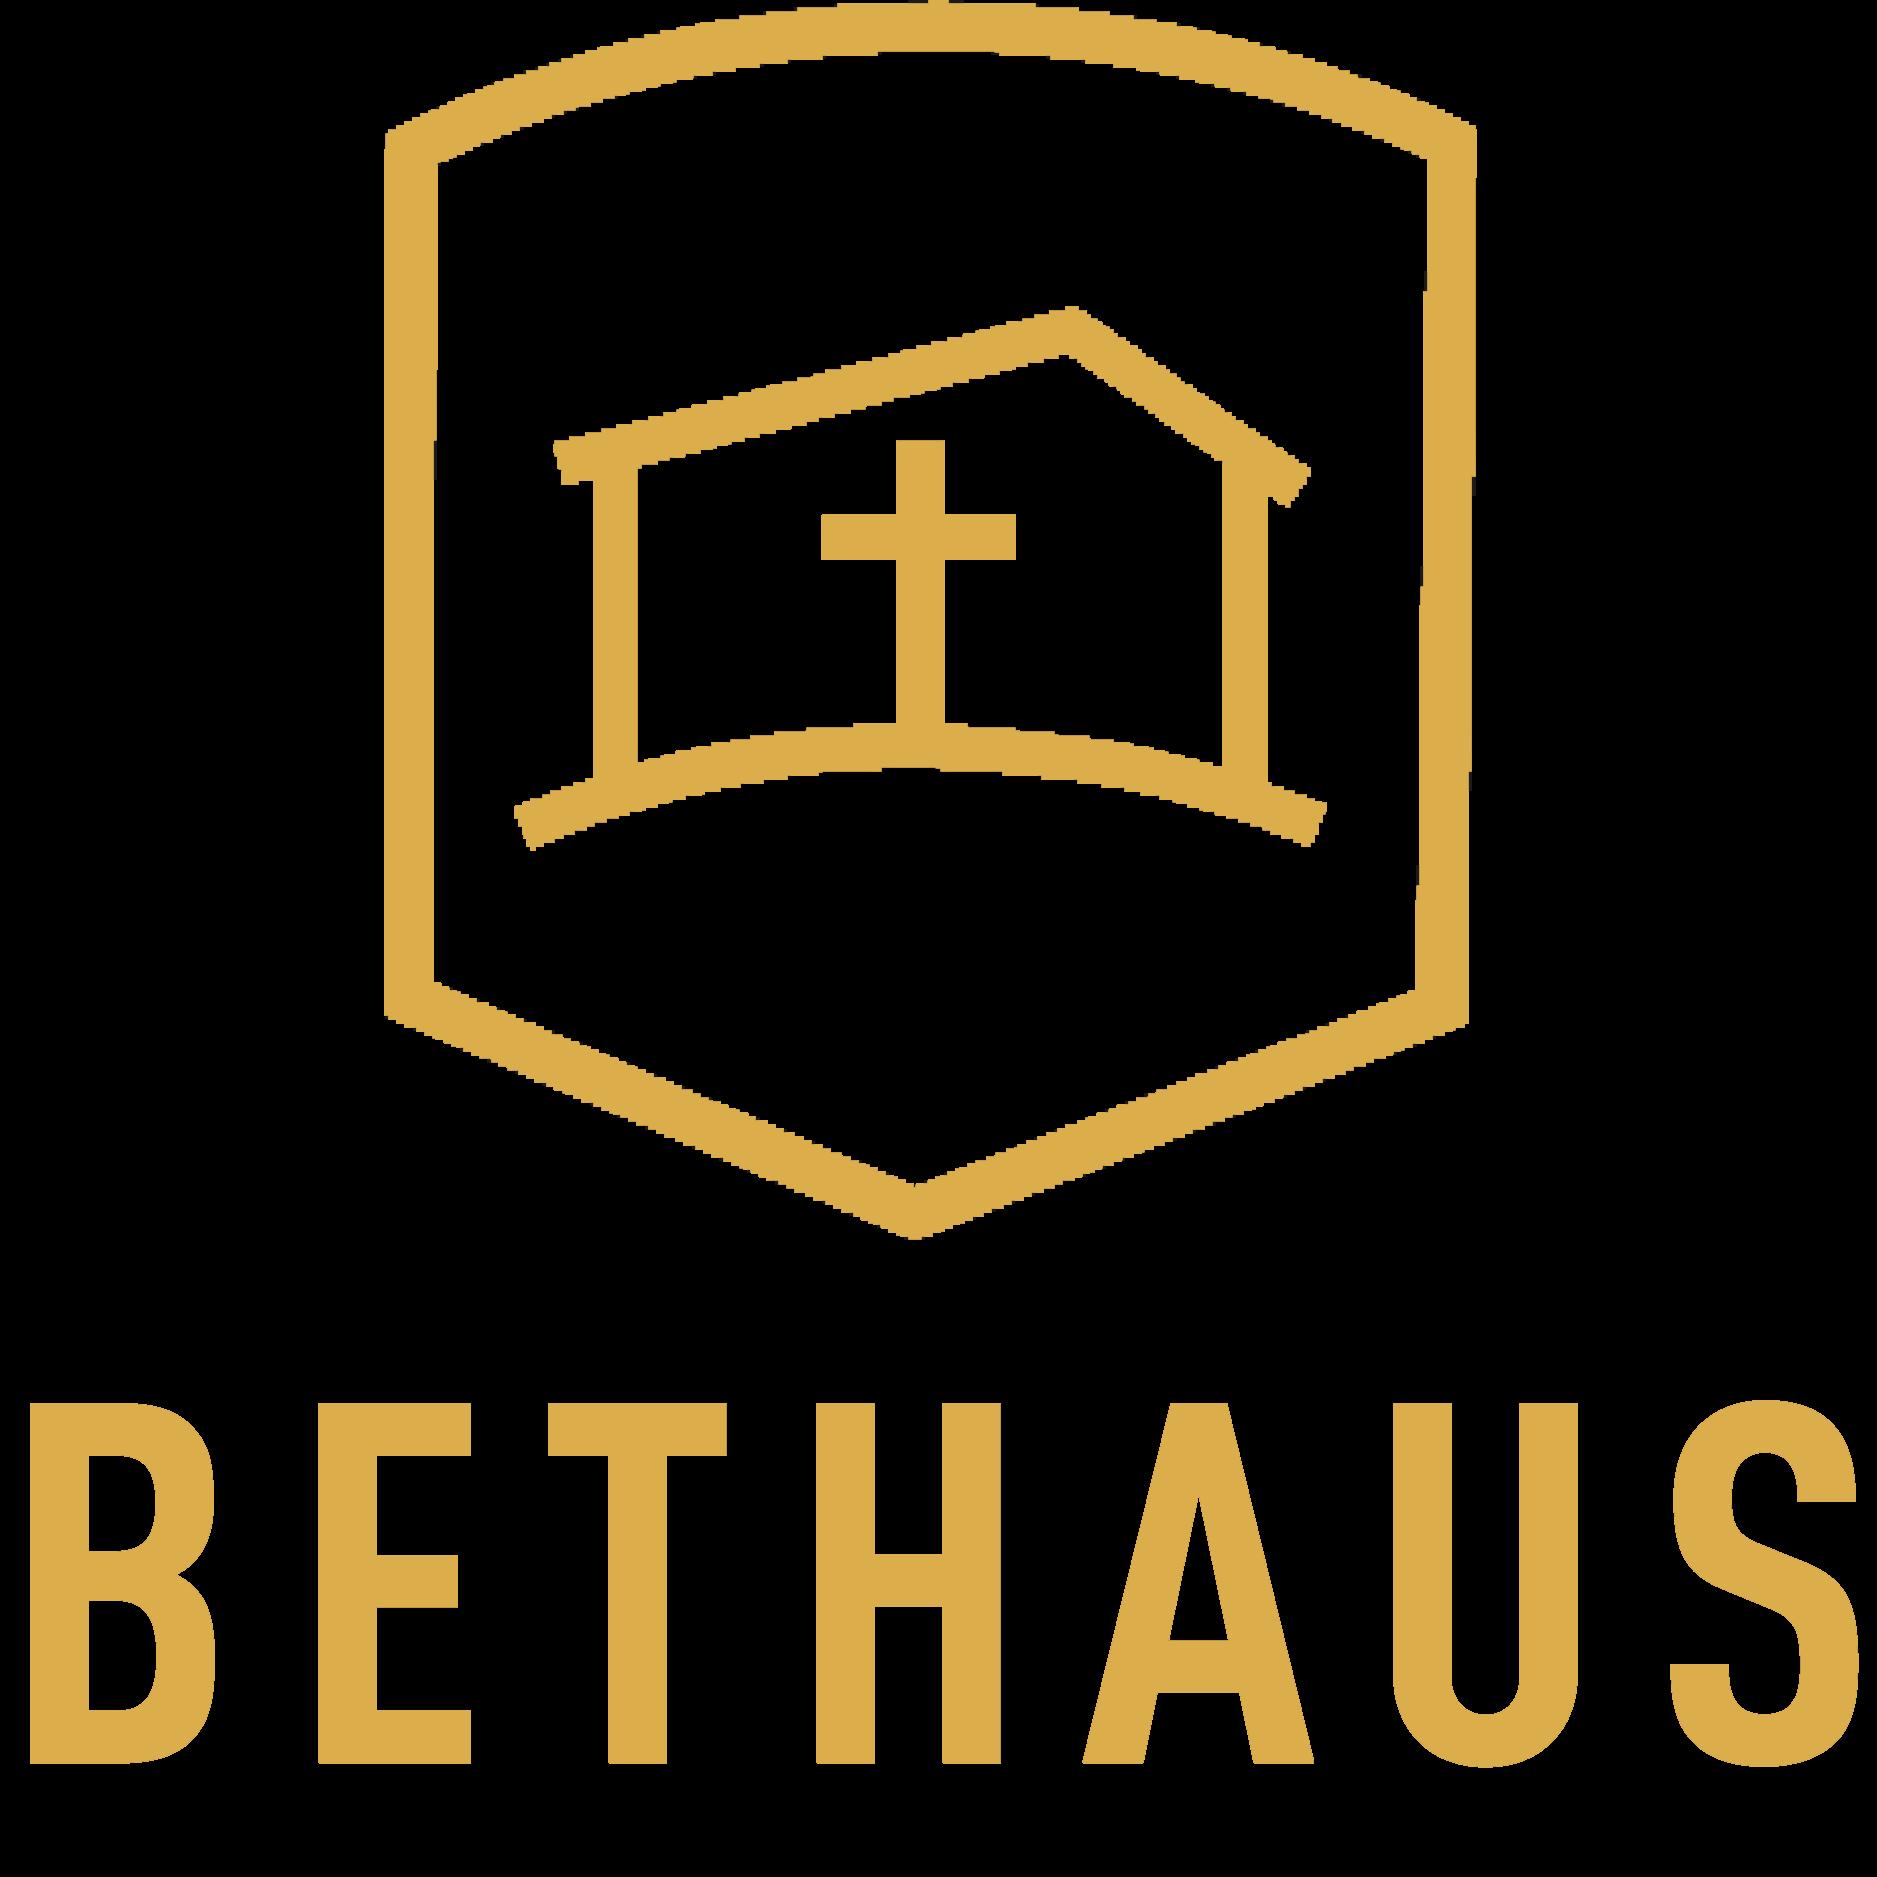 Bethaus